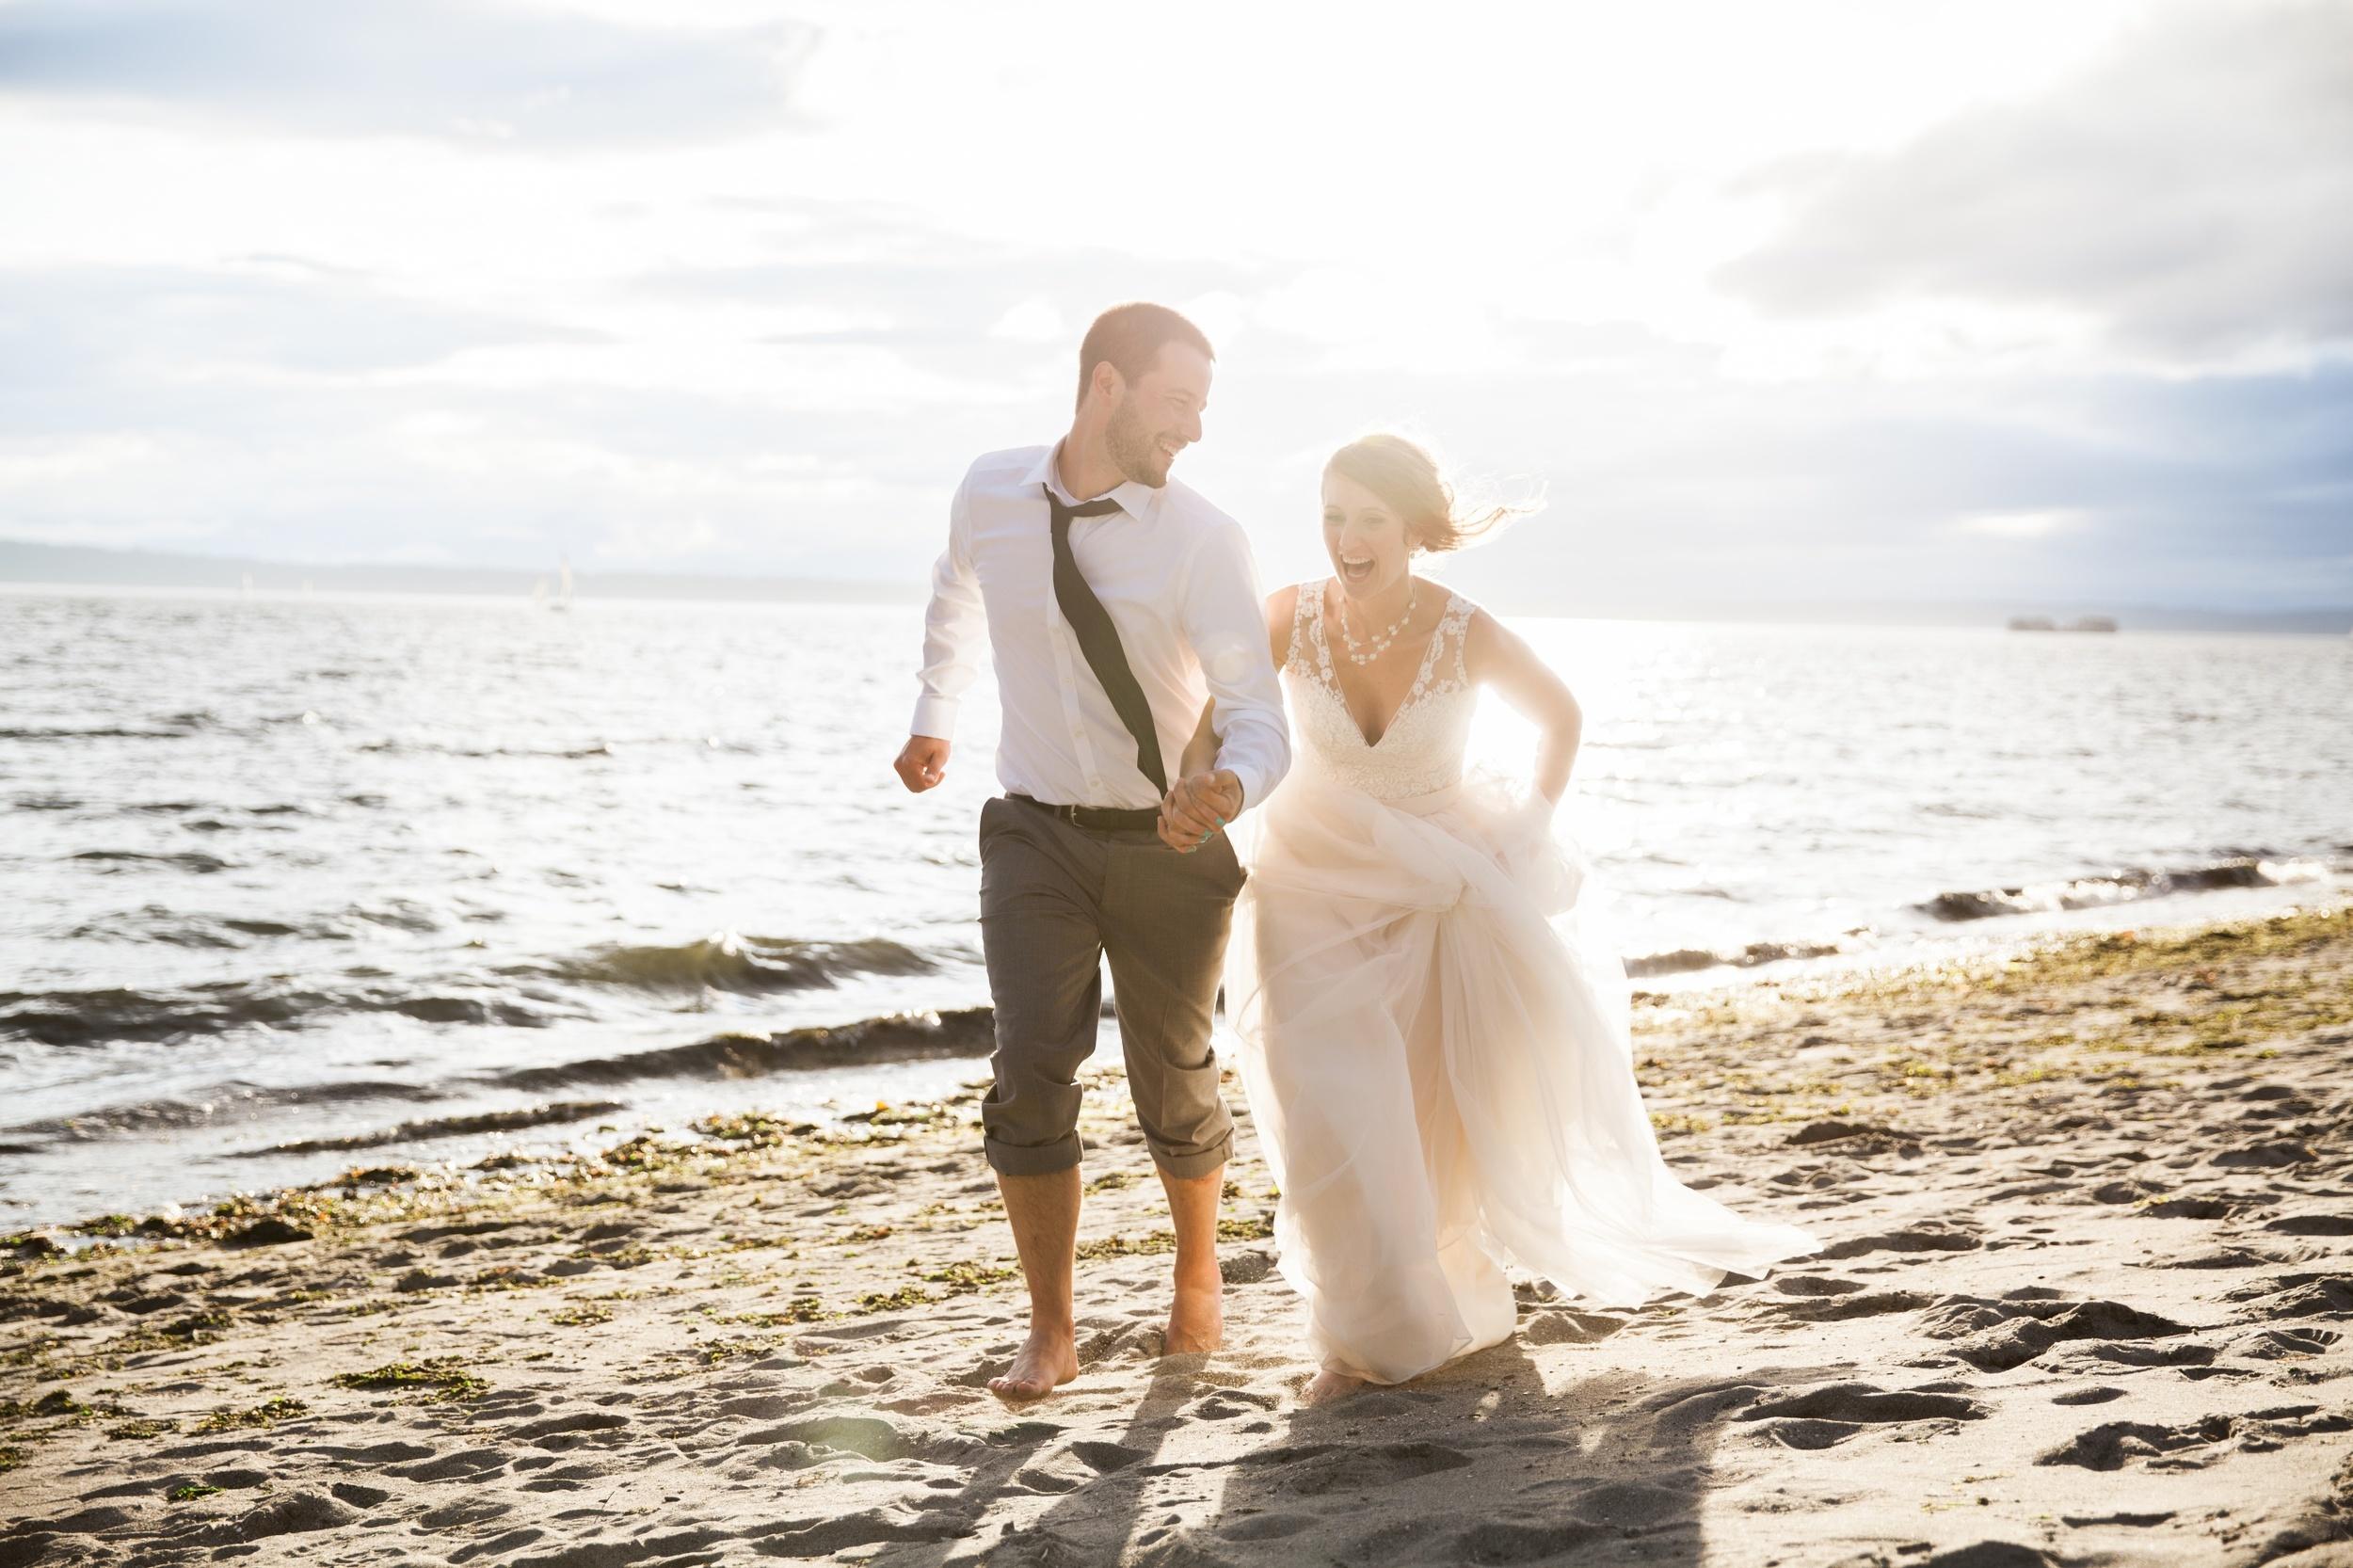 seattle wedding photographer film photography golden garden gardens state park ocean sand bride groom 41.jpg